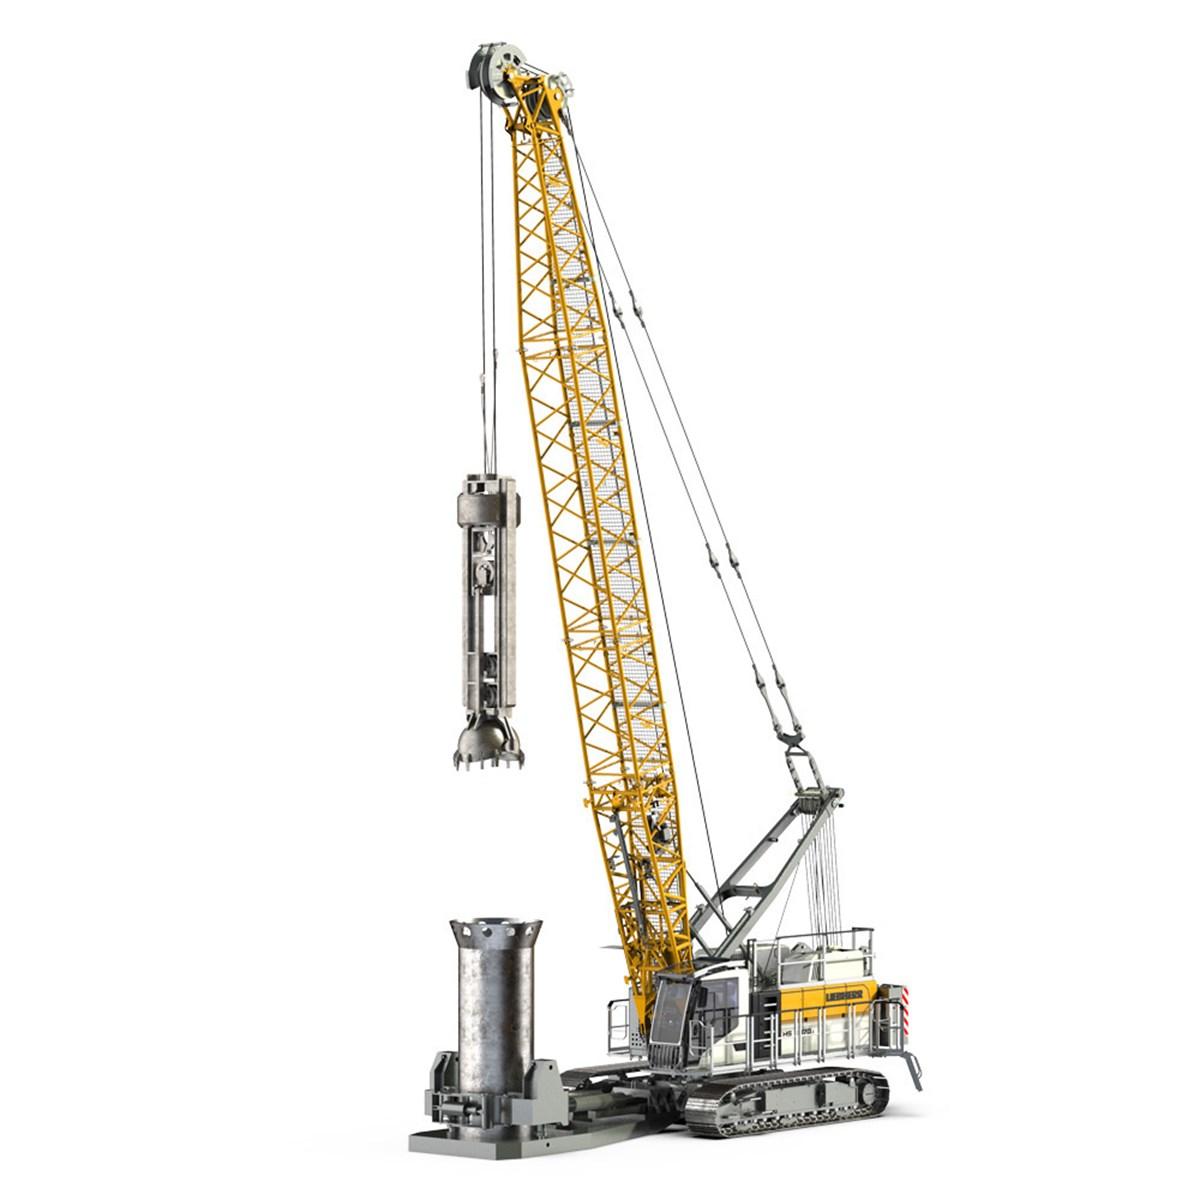 liebherr-hs-8070-1-seilbagger-duty-cycle-crawler-crane-kugelgreifer-bohren-g.jpg